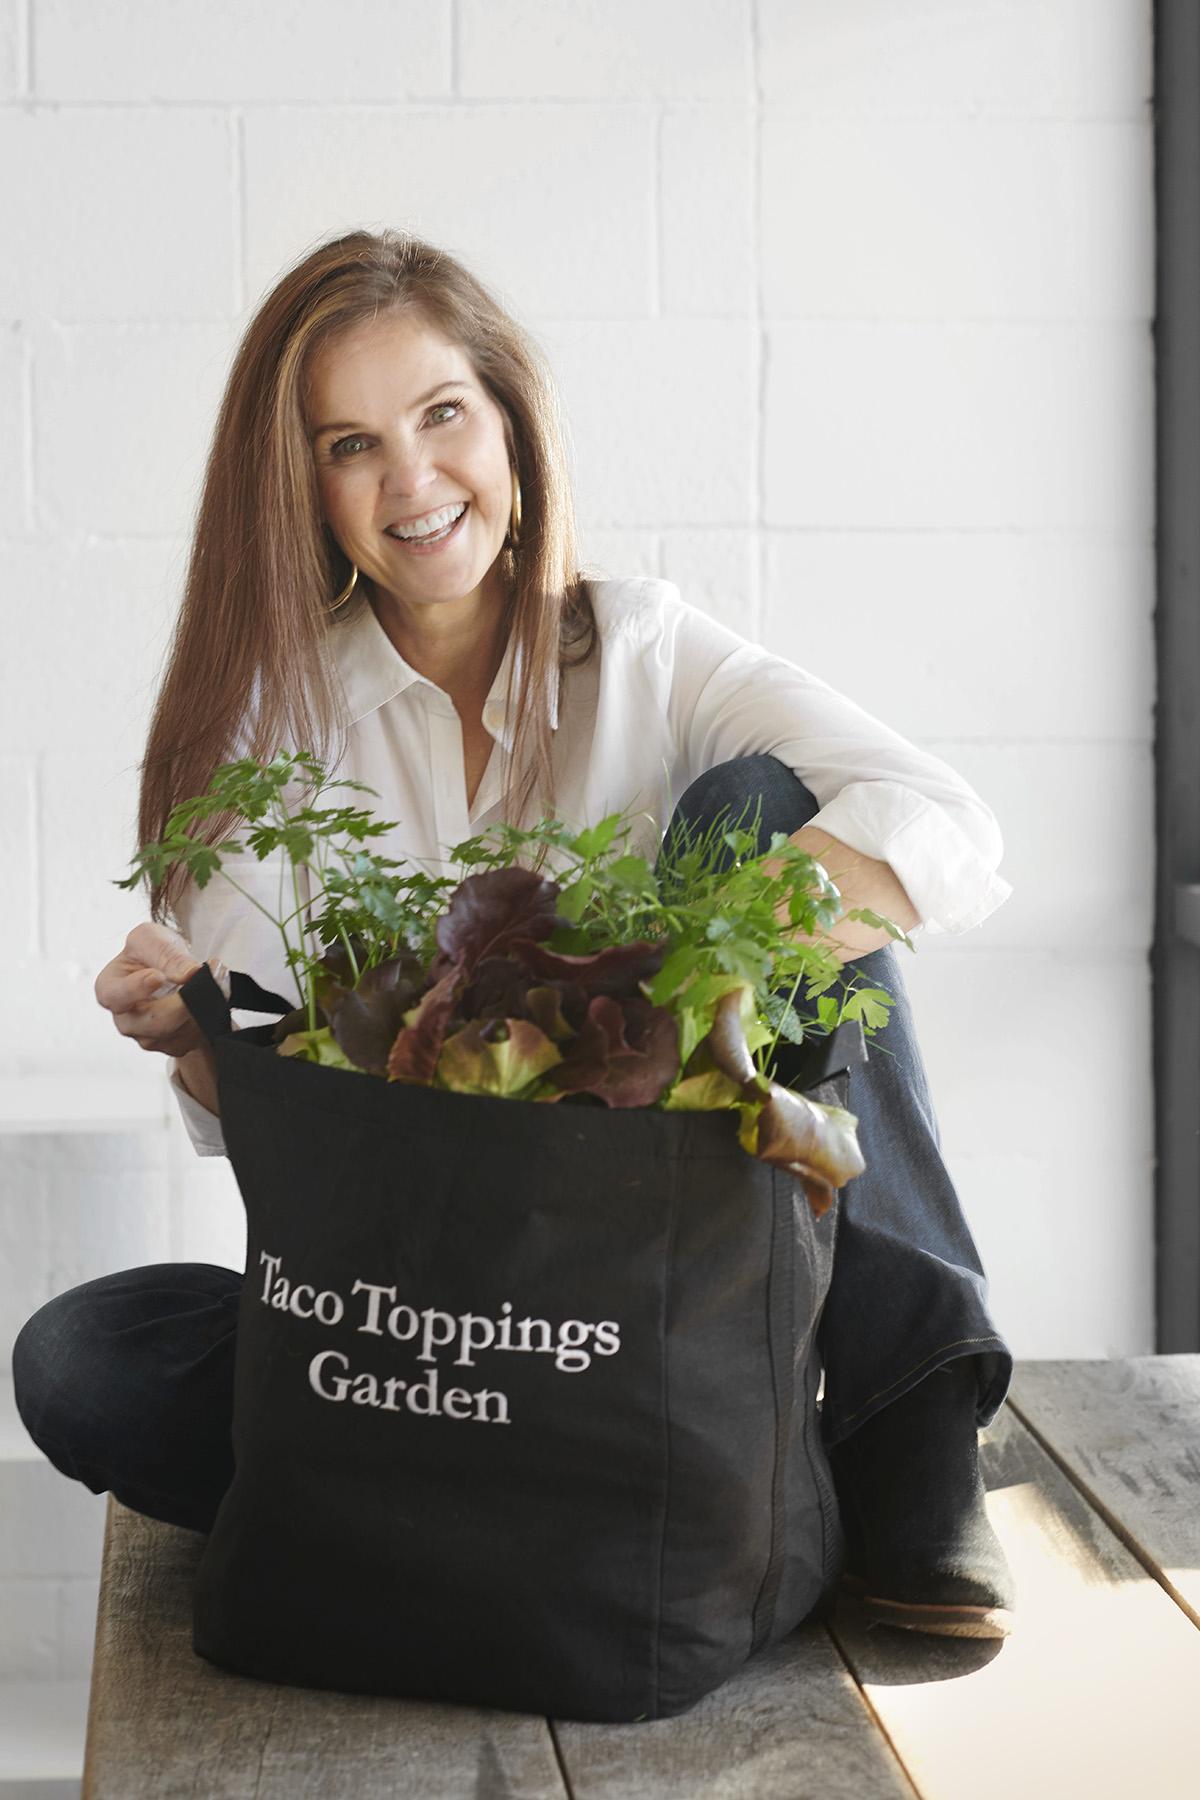 julie eggers gardenuity co-founder